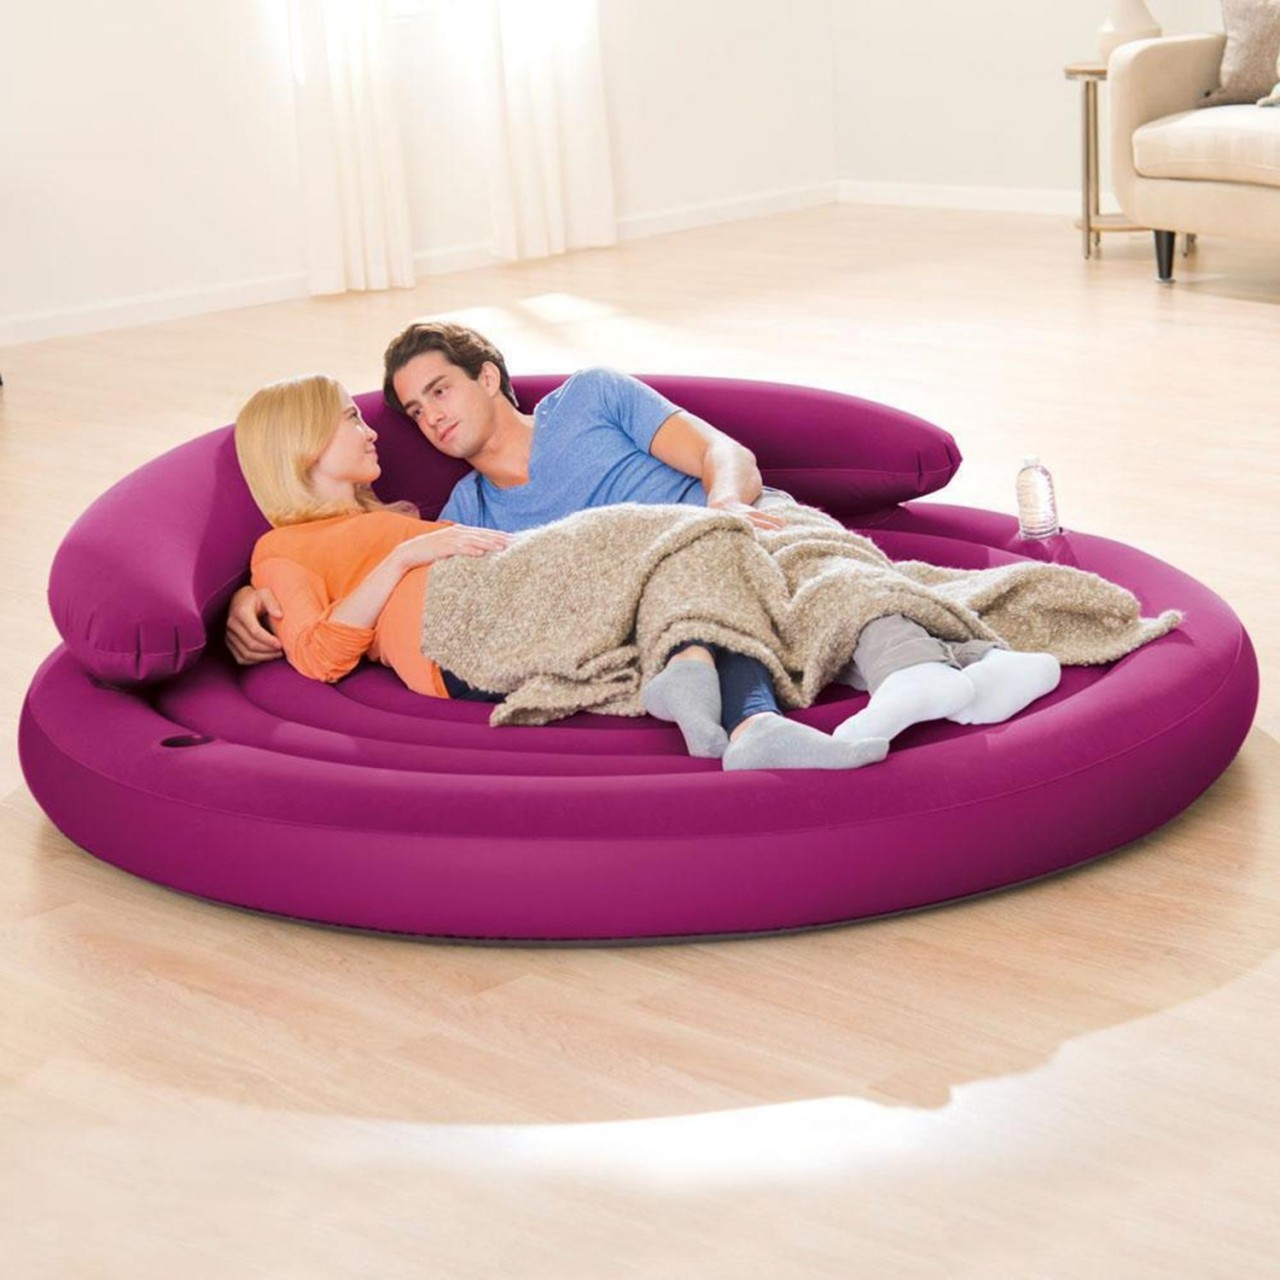 Intex 68881 Luftbett Gästebett Ultra Lounge Sofa Rund Aufblasbar 191x53 cm